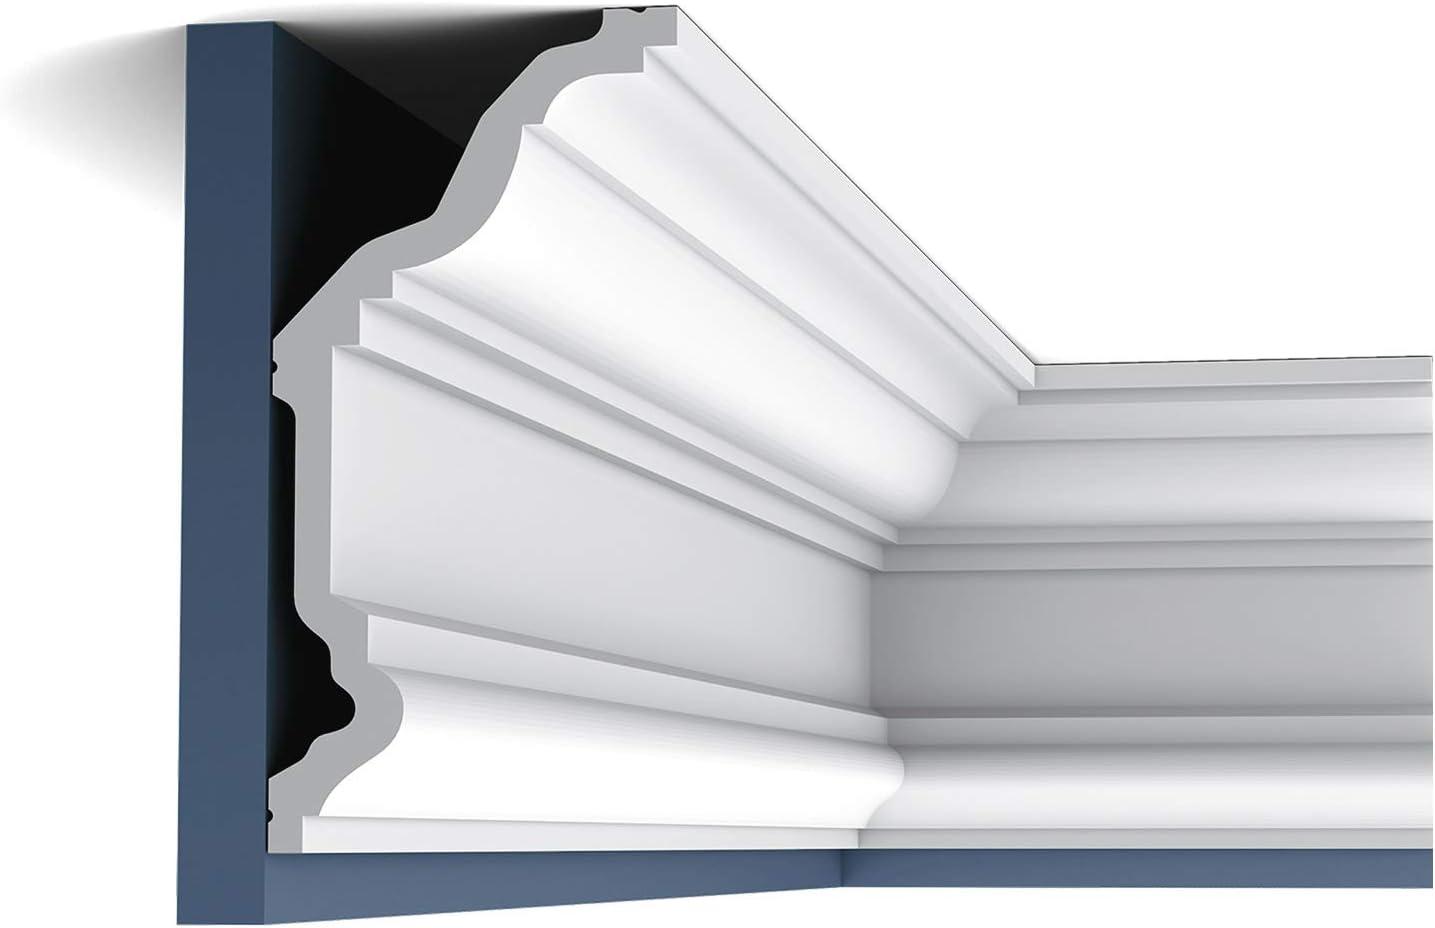 Cornice Moulding Orac Decor C832 XTERIO Decorative Moulding Timeless Classic White 2m